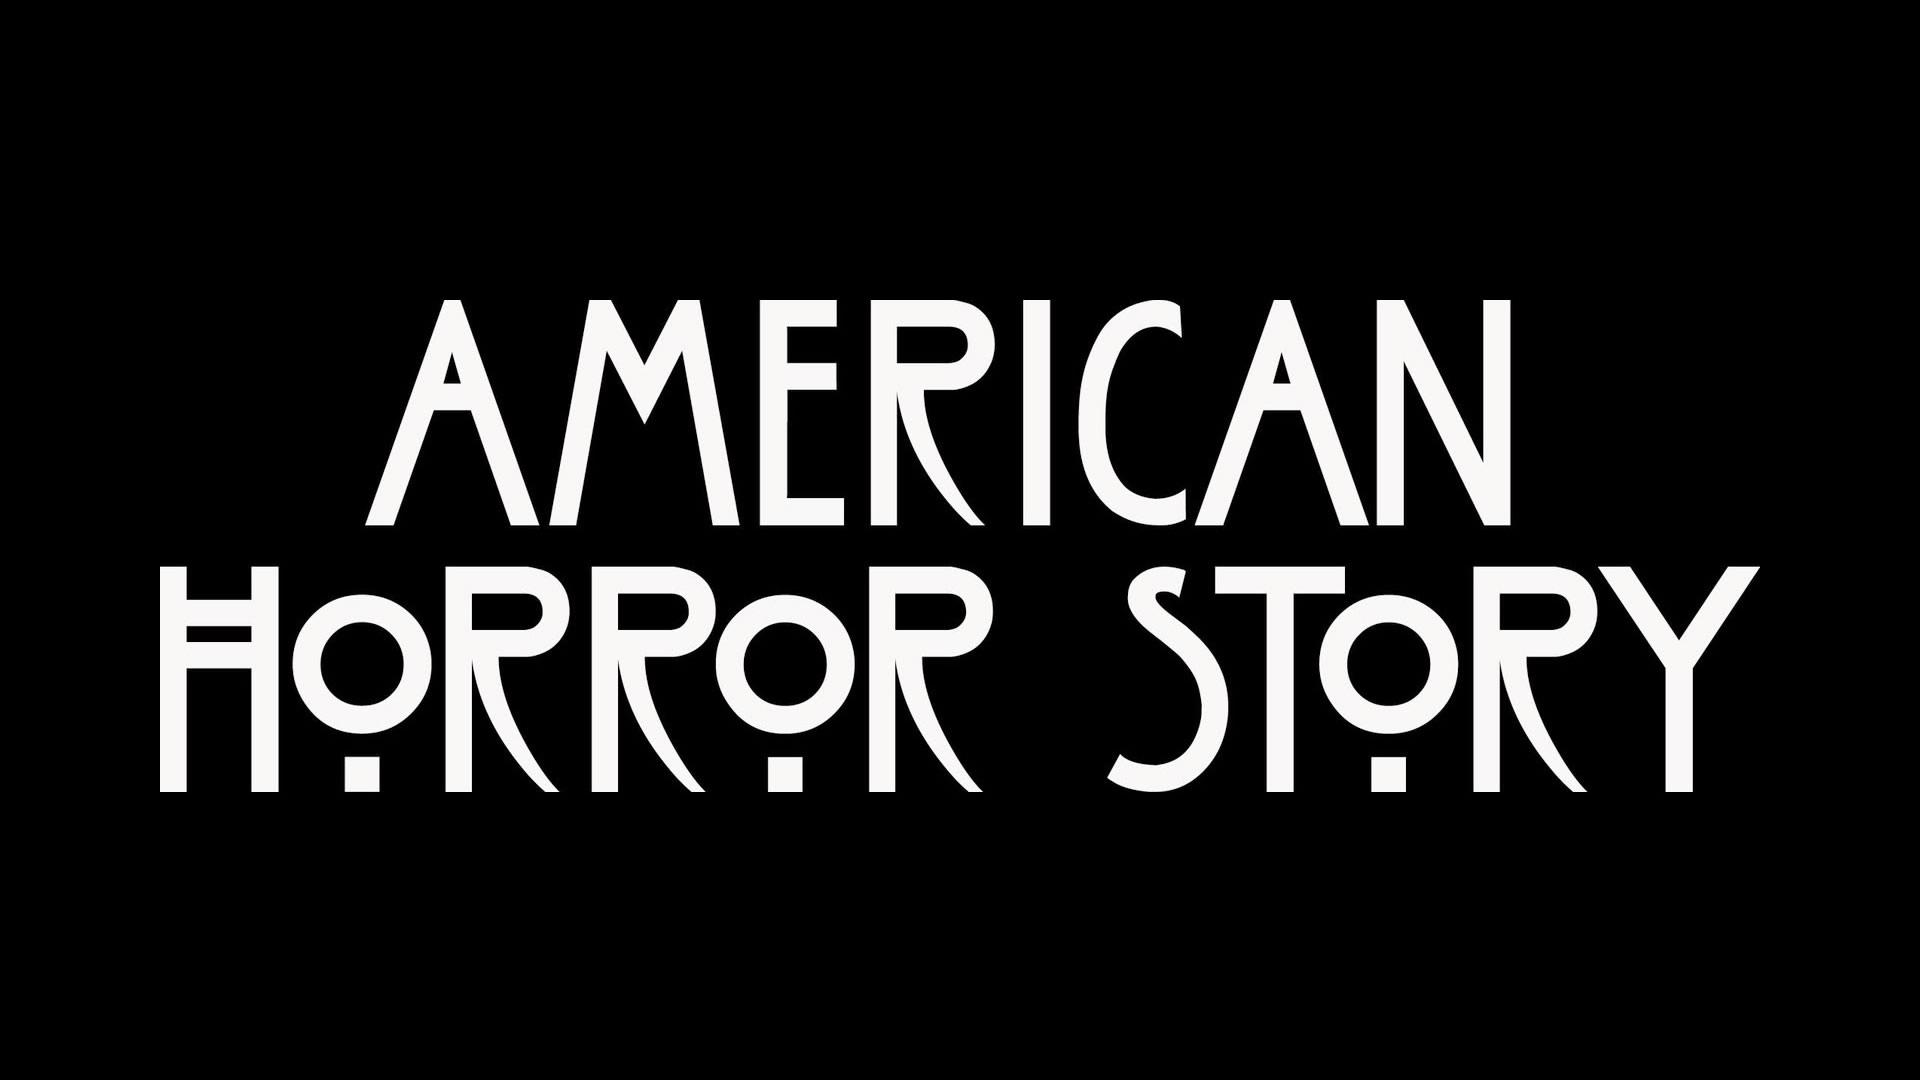 1920x1080px American Horror Story Wallpaper Hd Wallpapersafari